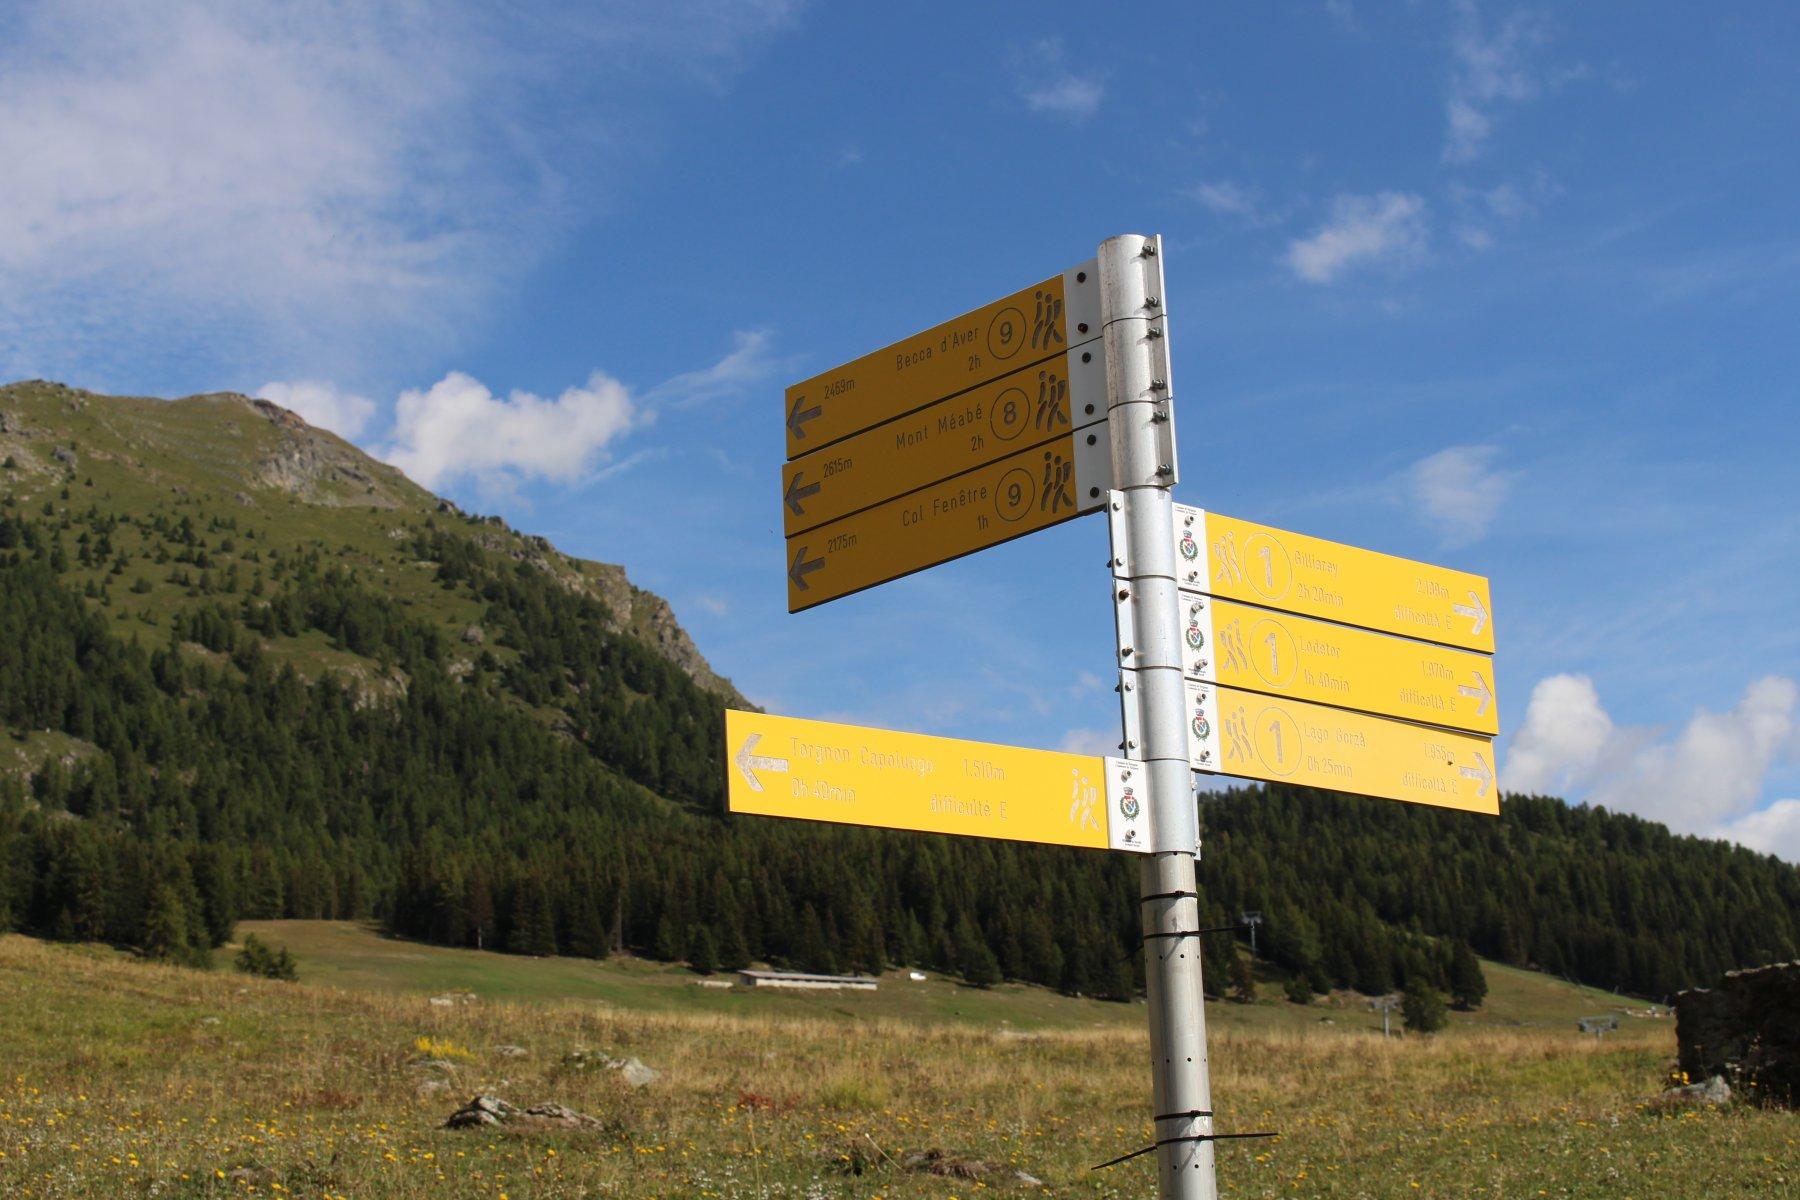 segnaletica alla partenza del sentiero